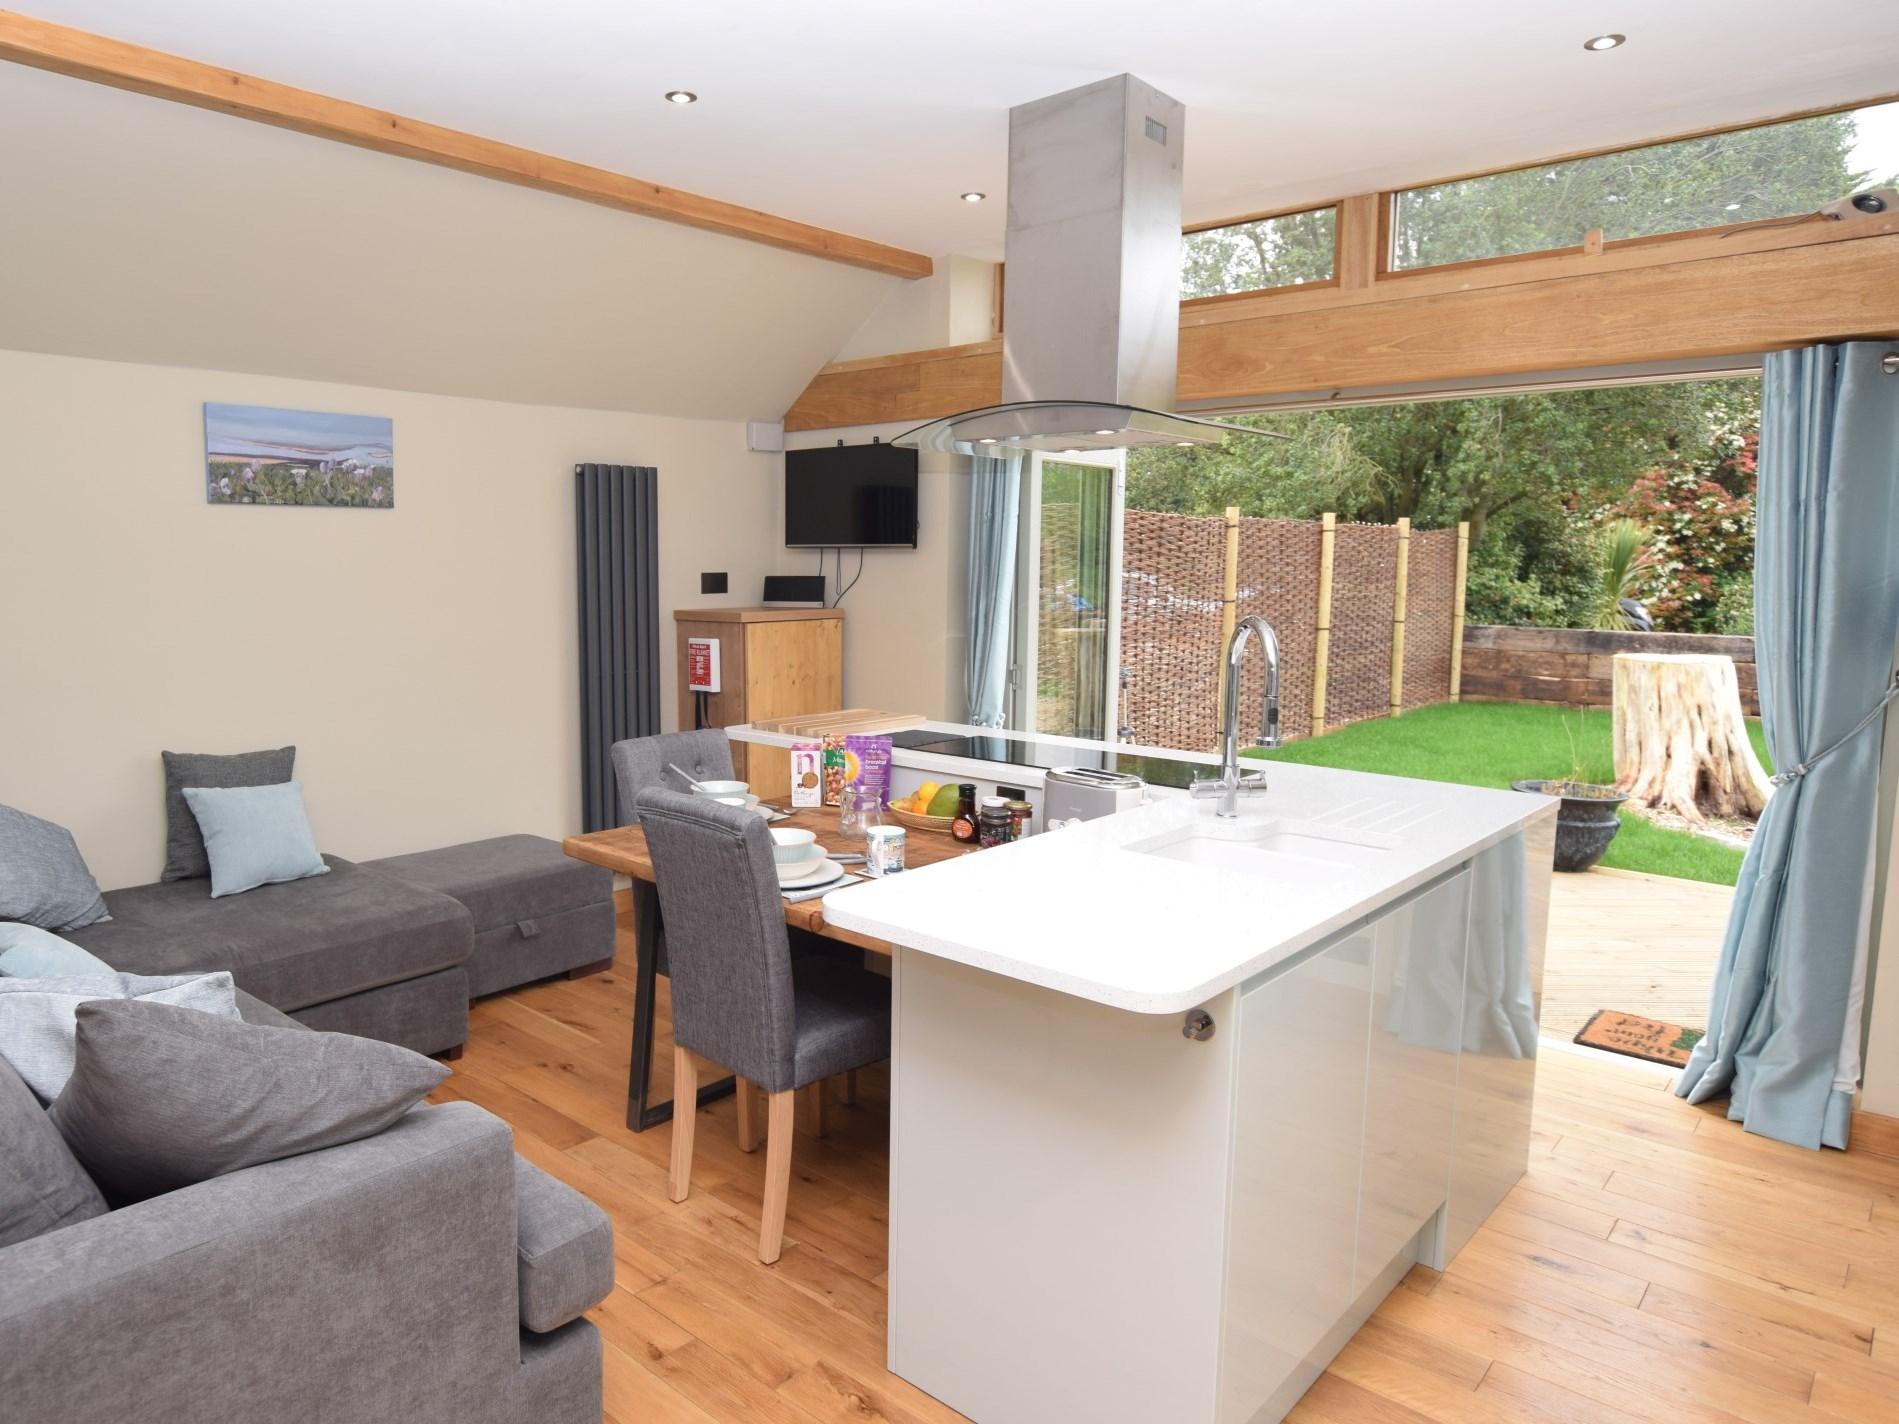 Open-plan Lounge/kitchen/dining/sleeping area